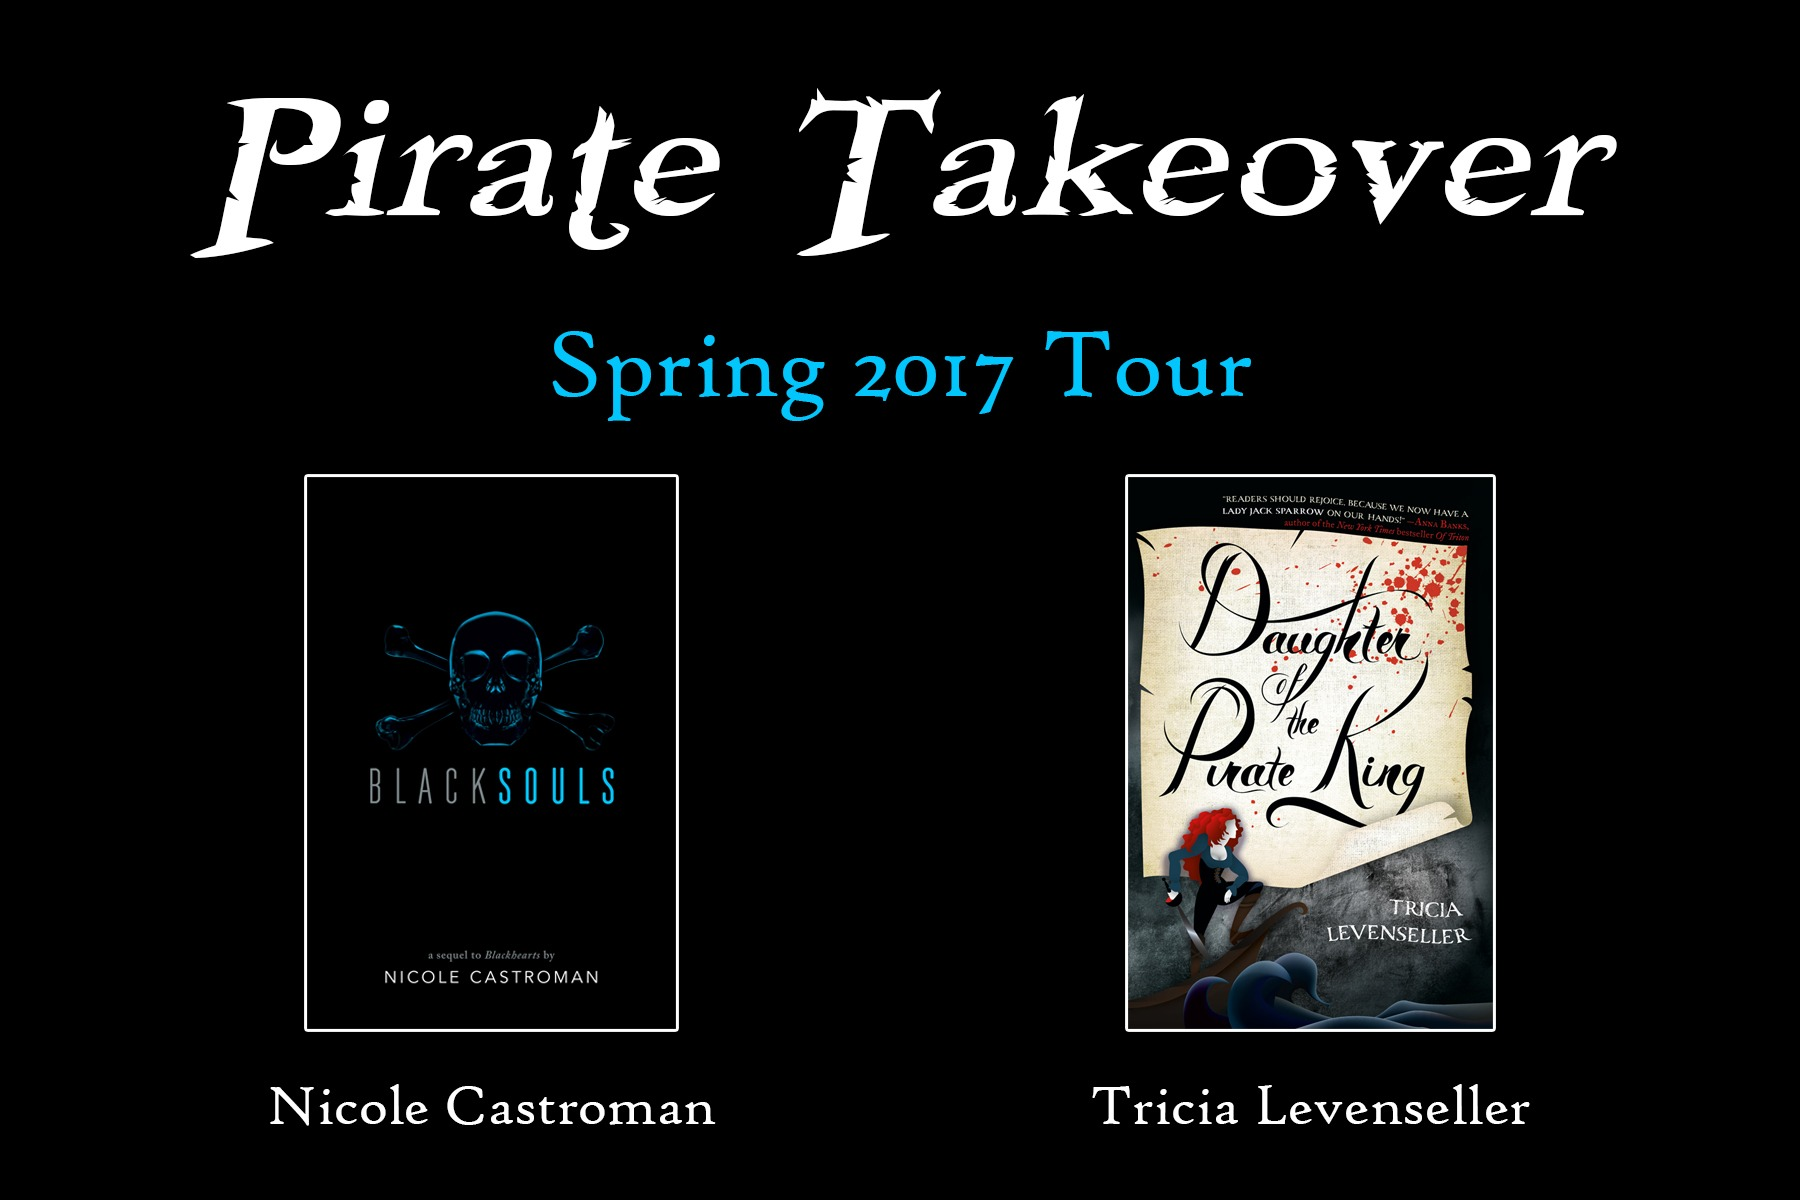 Pirate Takeover Tour